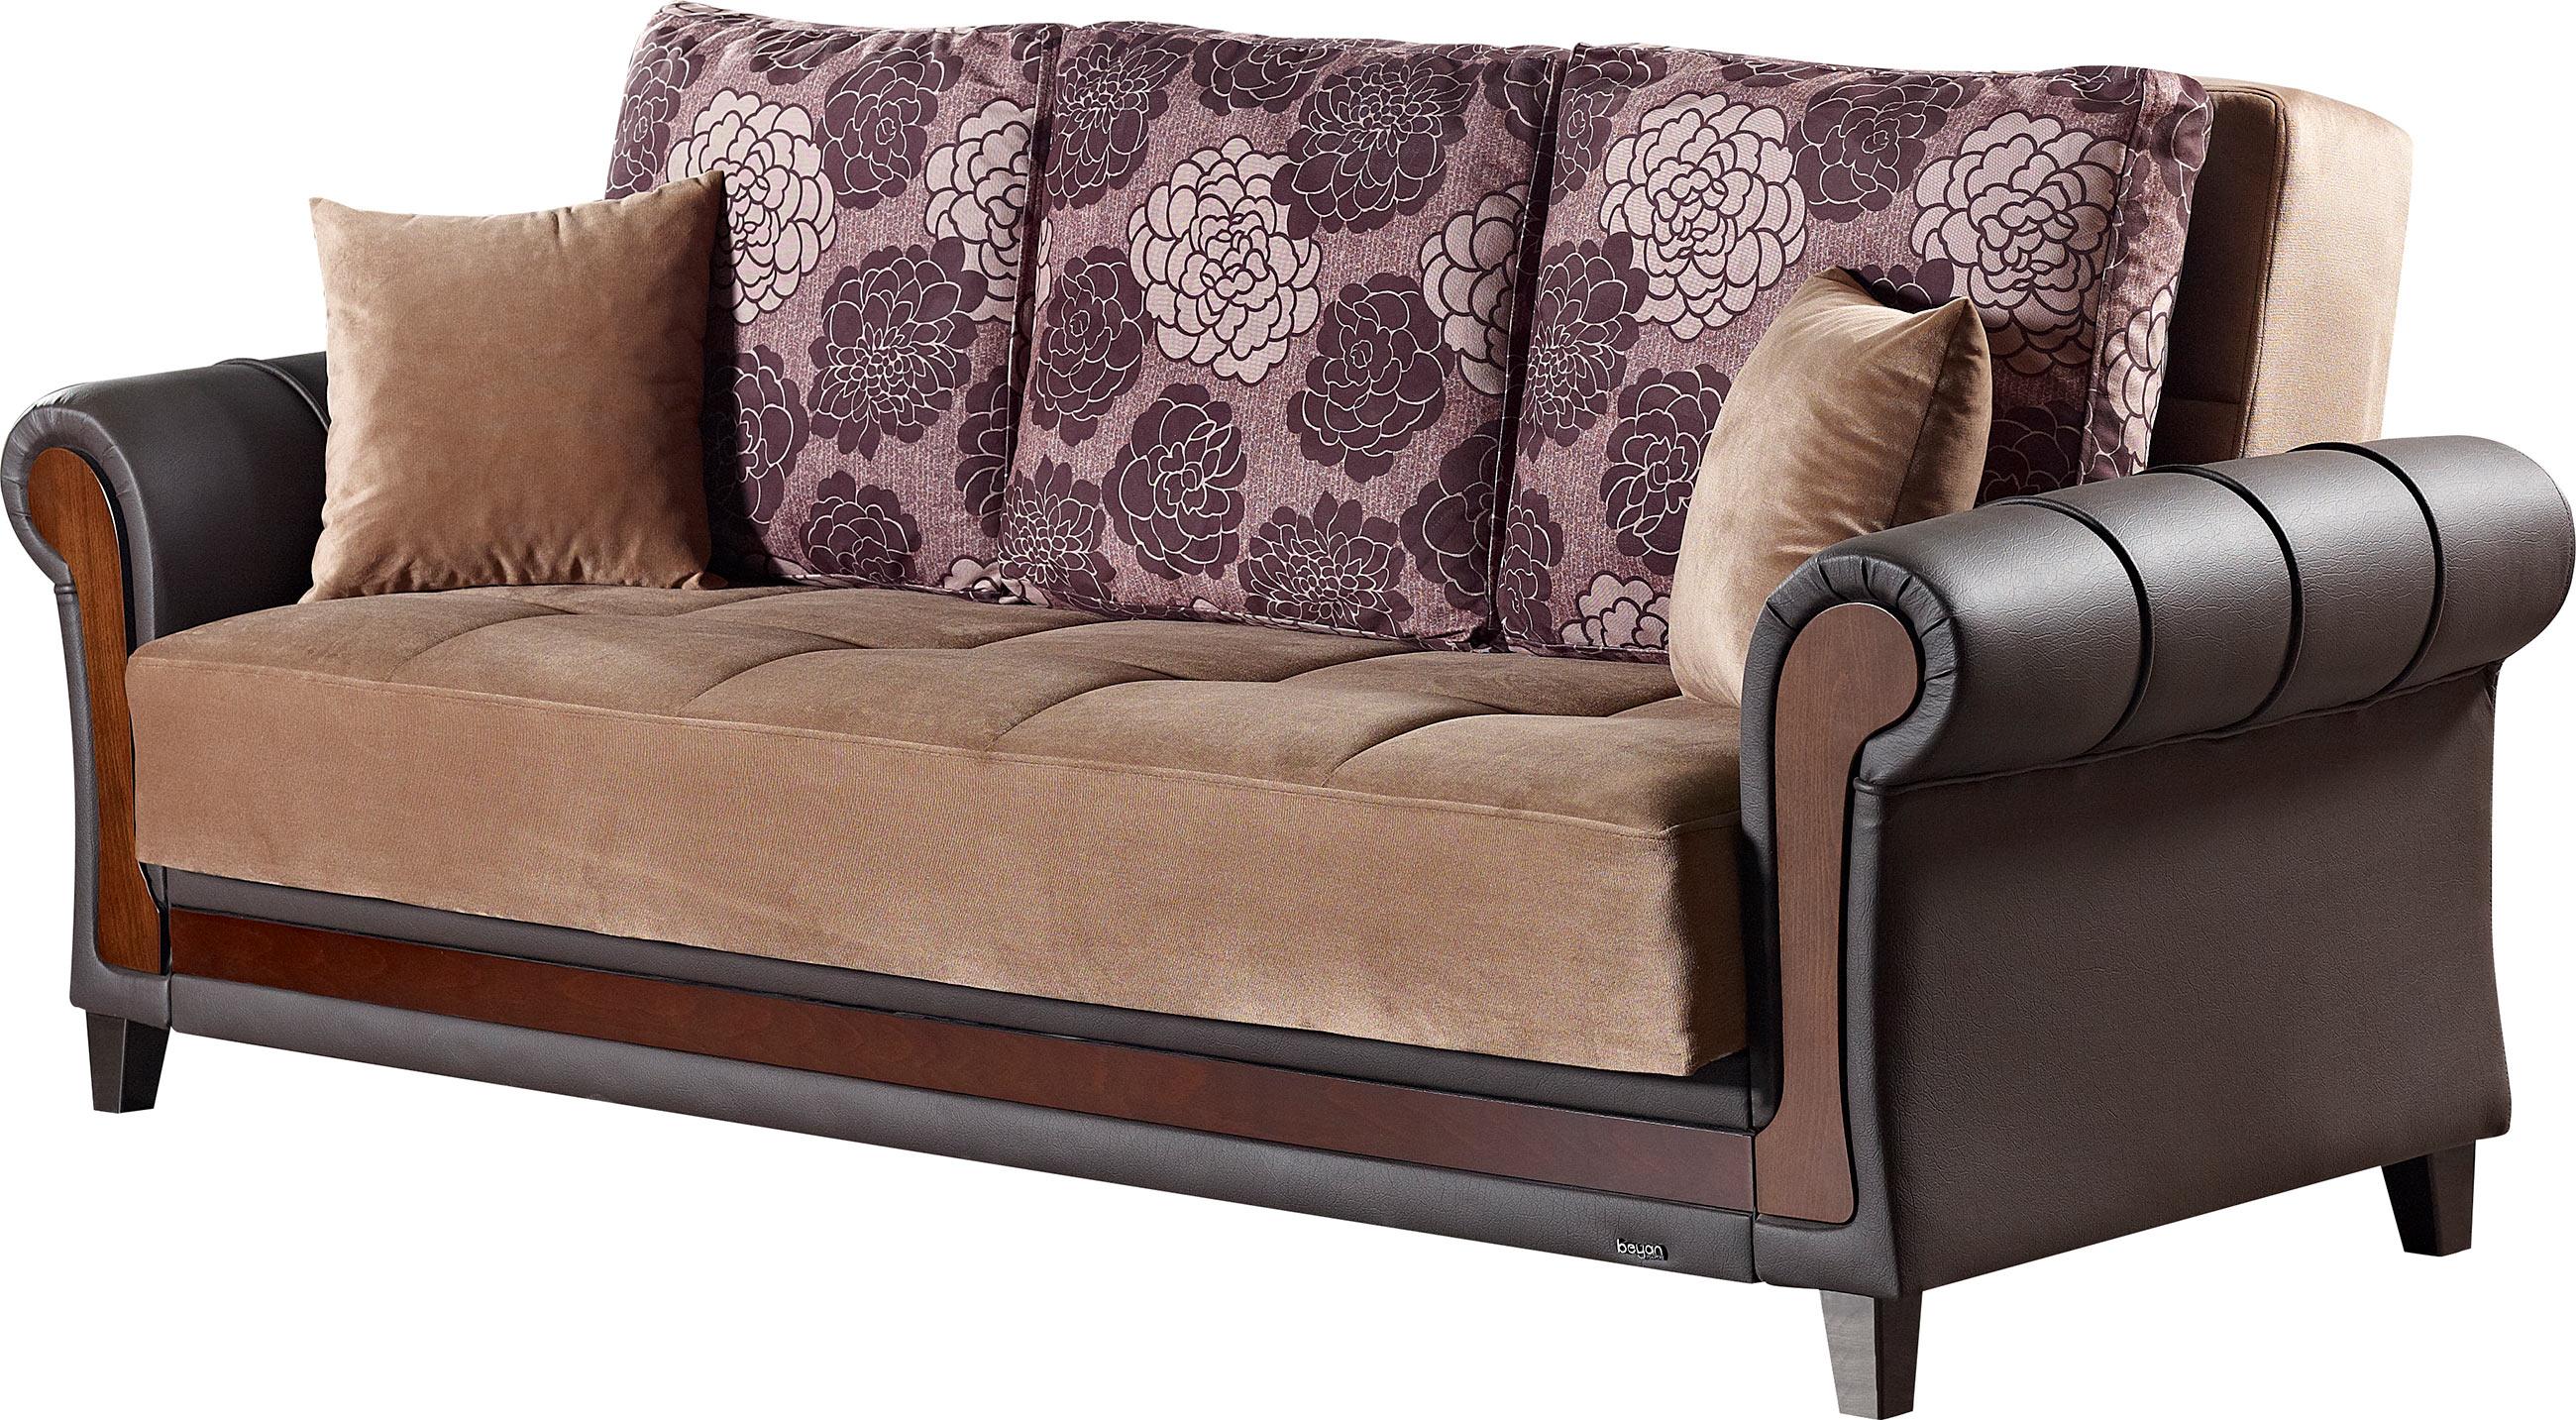 Idaho Brown Fabric Sofa Bed by Empire Furniture USA